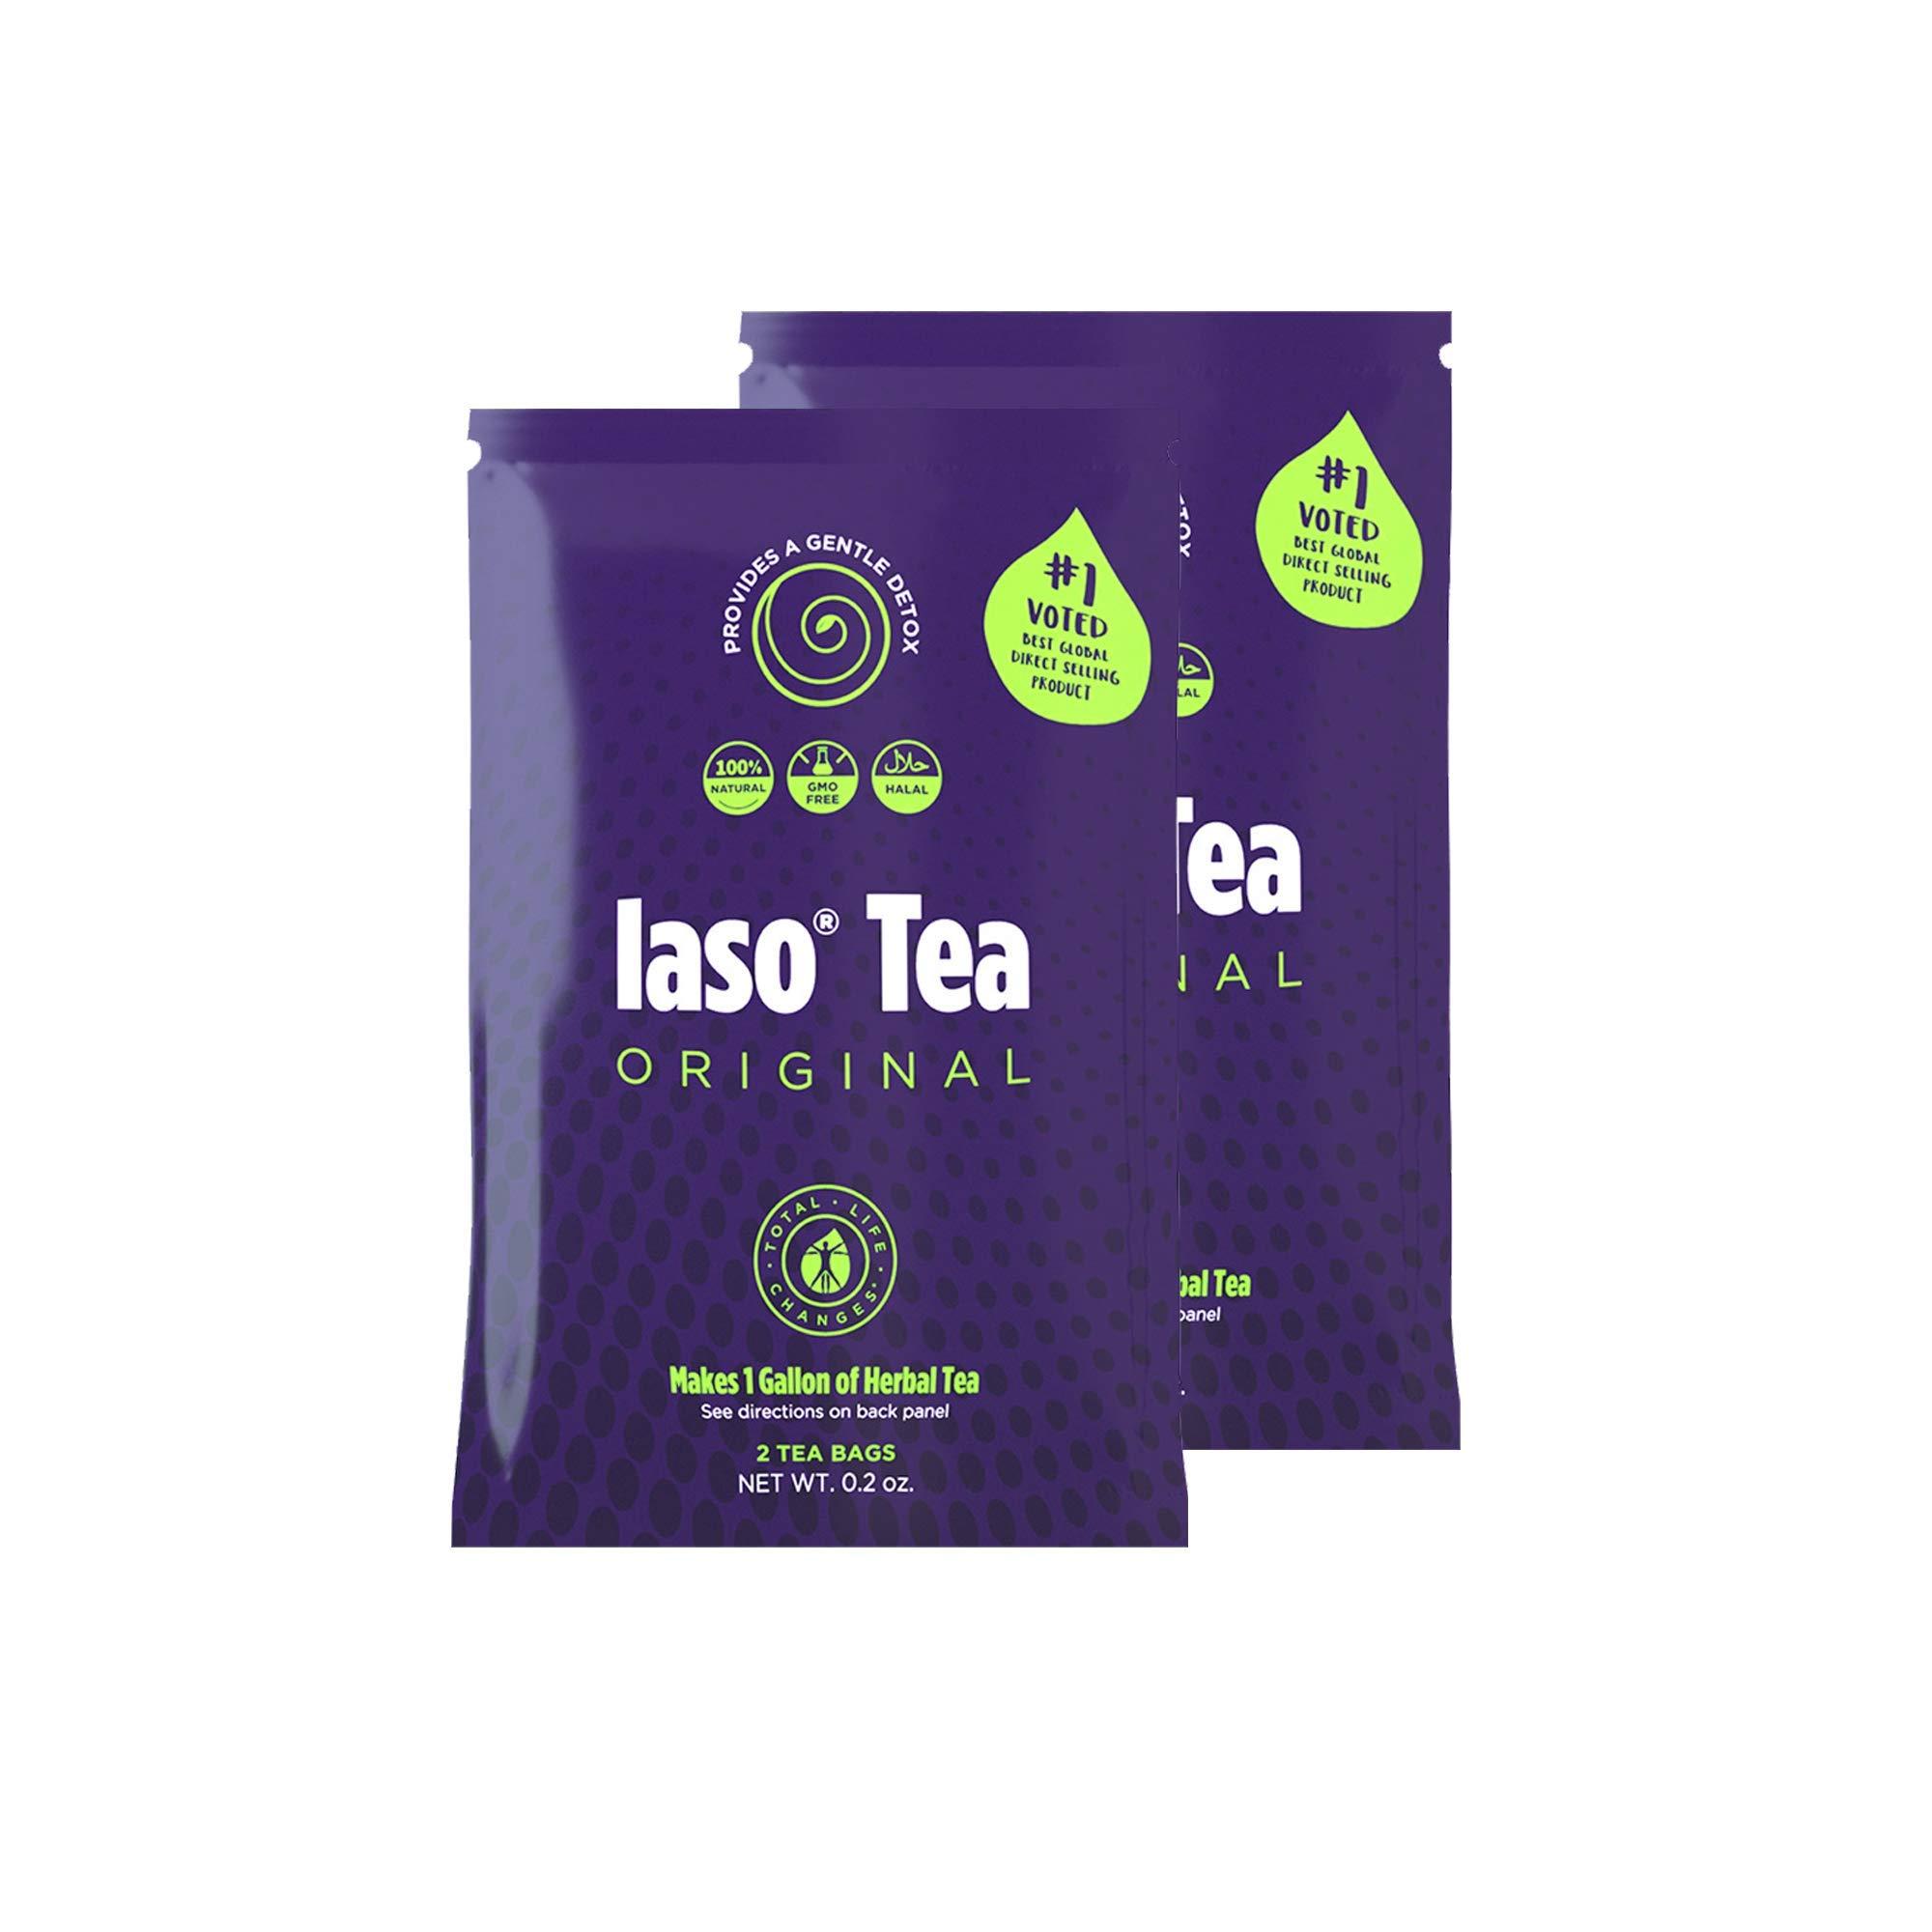 TLC Total Life Changes IASO Natural Herbal Detox Tea Bags - Double Pack (4 Tea Bags) Packaging May Vary Between Old & New in 2019